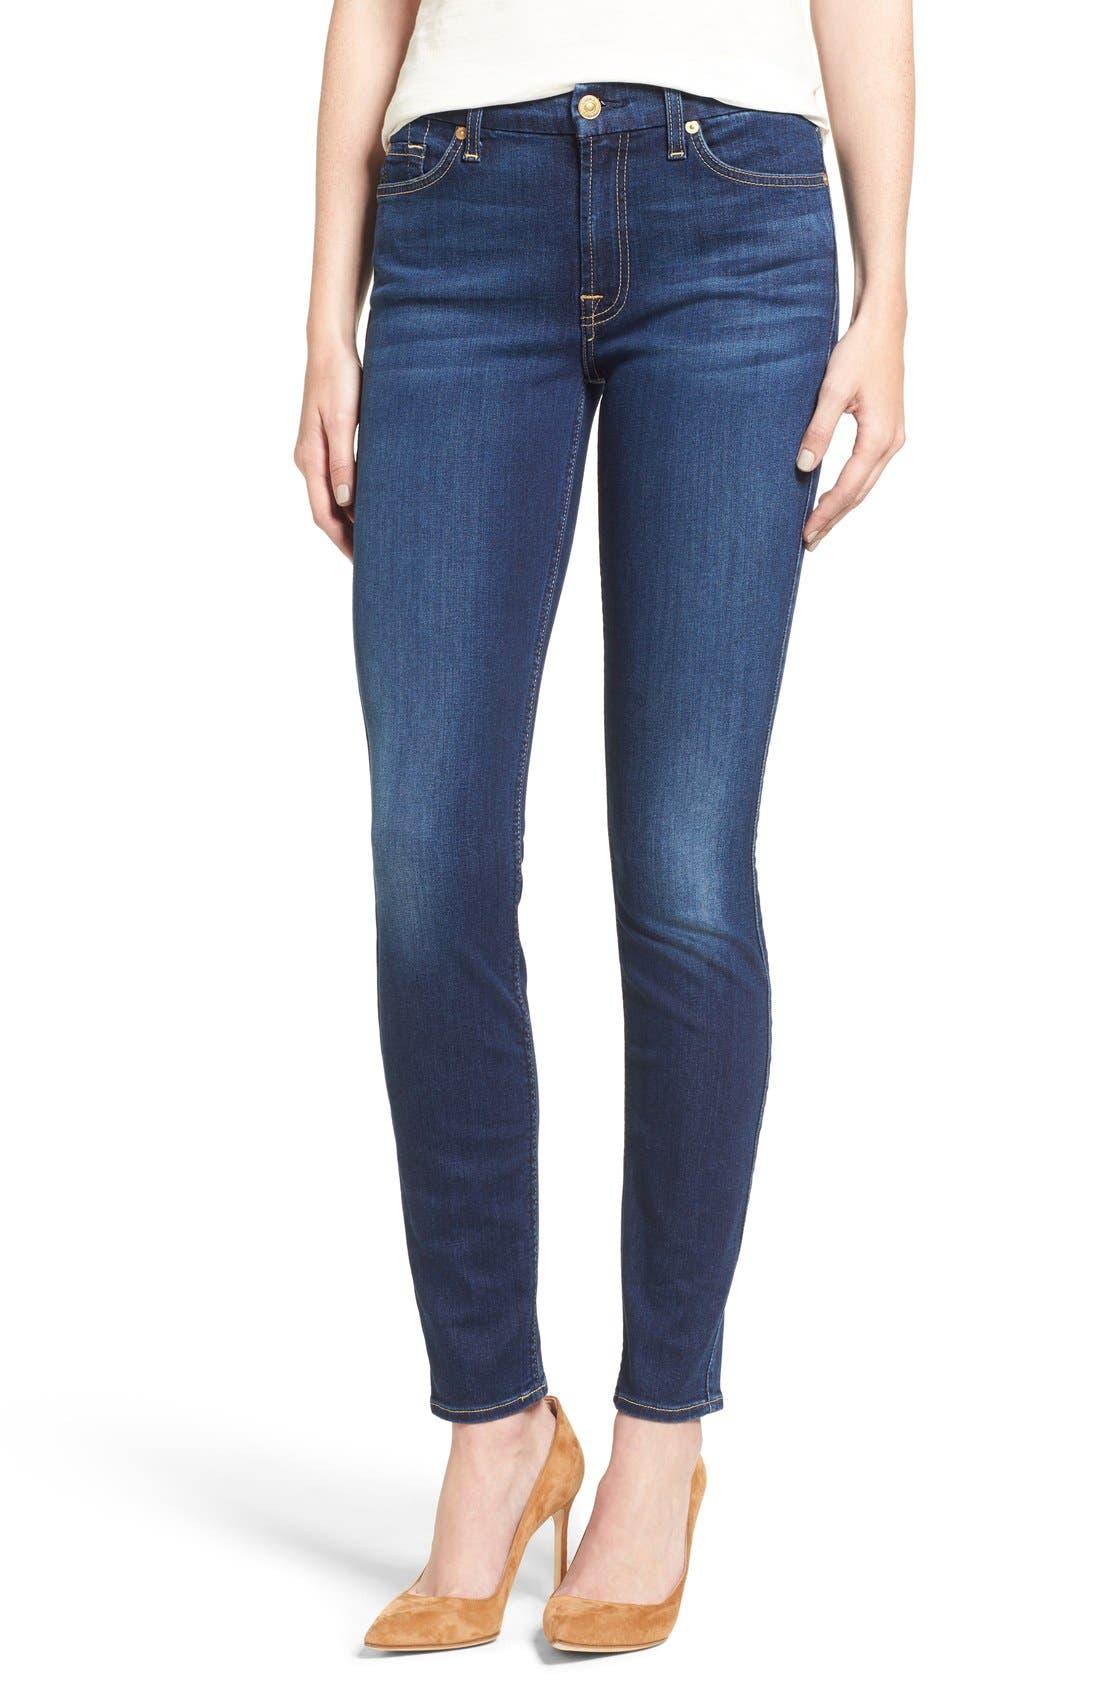 b(air) Skinny Jeans,                             Alternate thumbnail 6, color,                             400